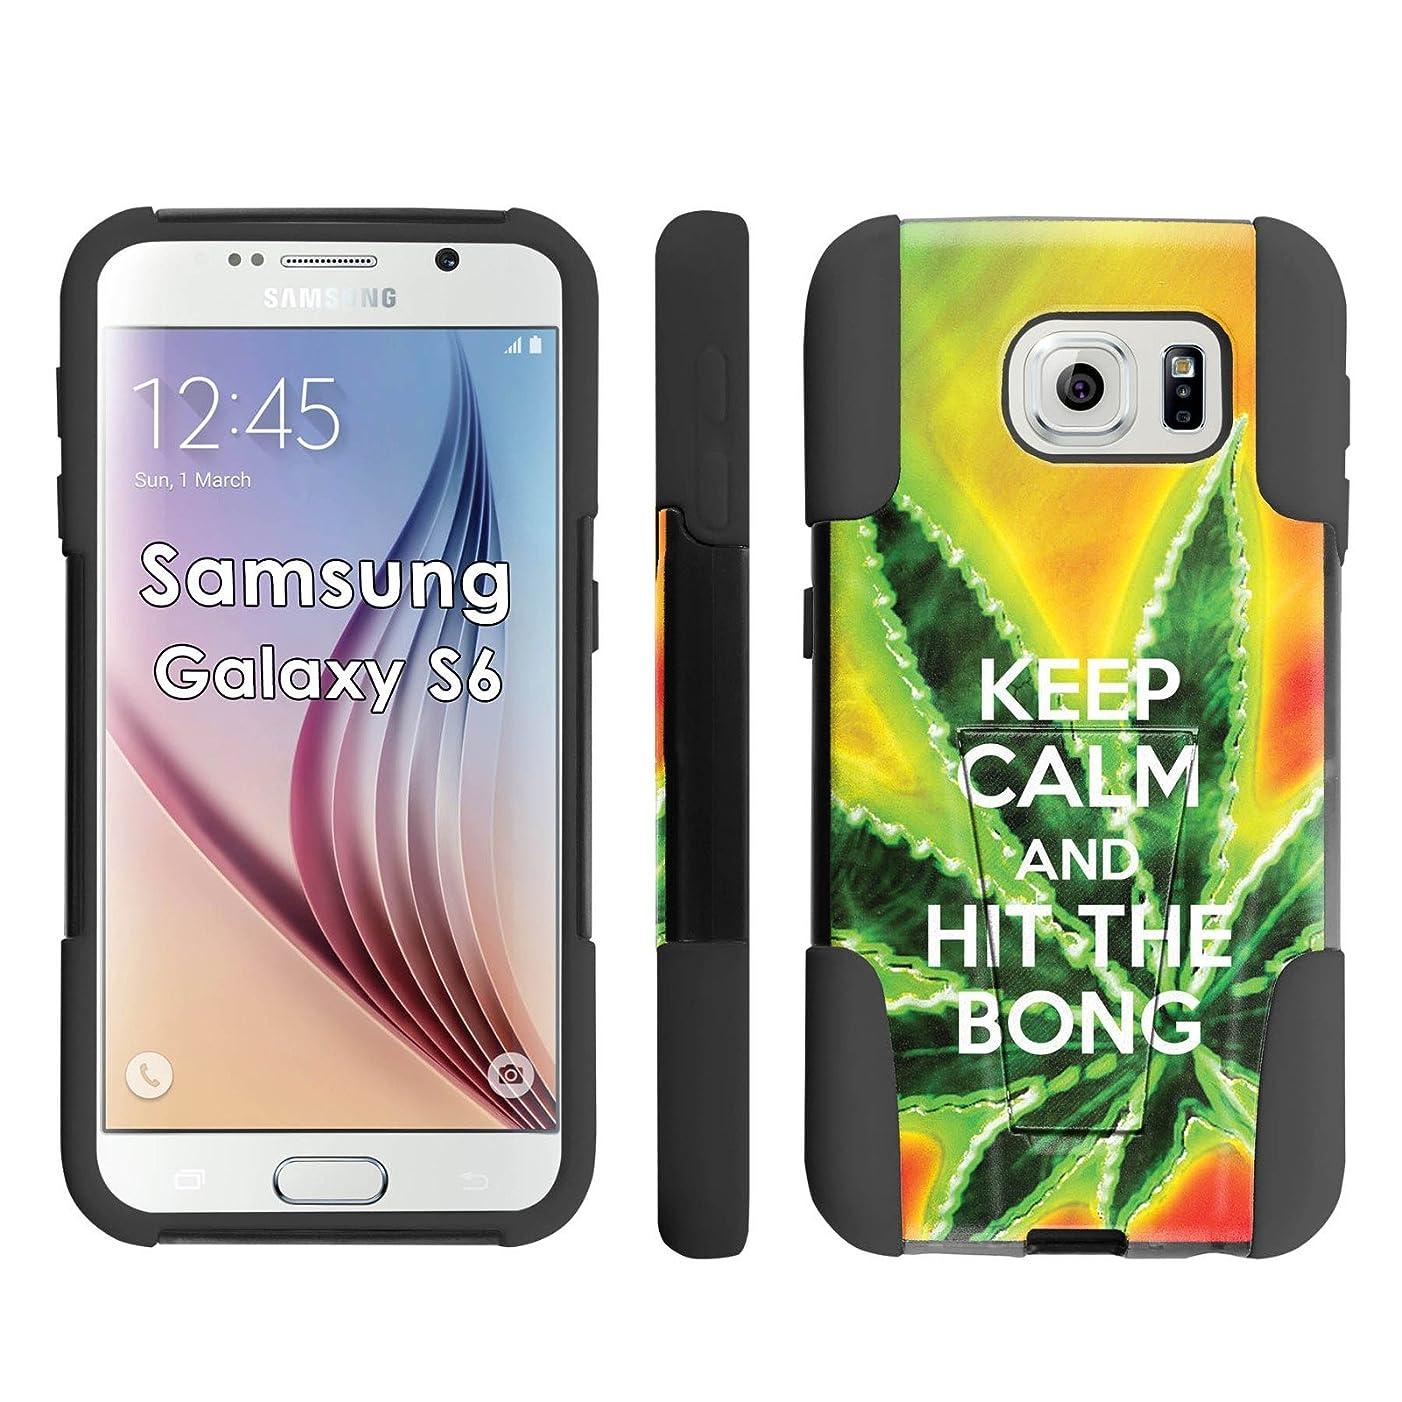 Samsung Galaxy S6 Phone Cover, Keep Calm Hit the Bong - Black Armor Kick Flip Grip Phone Case for Samsung Galaxy S6